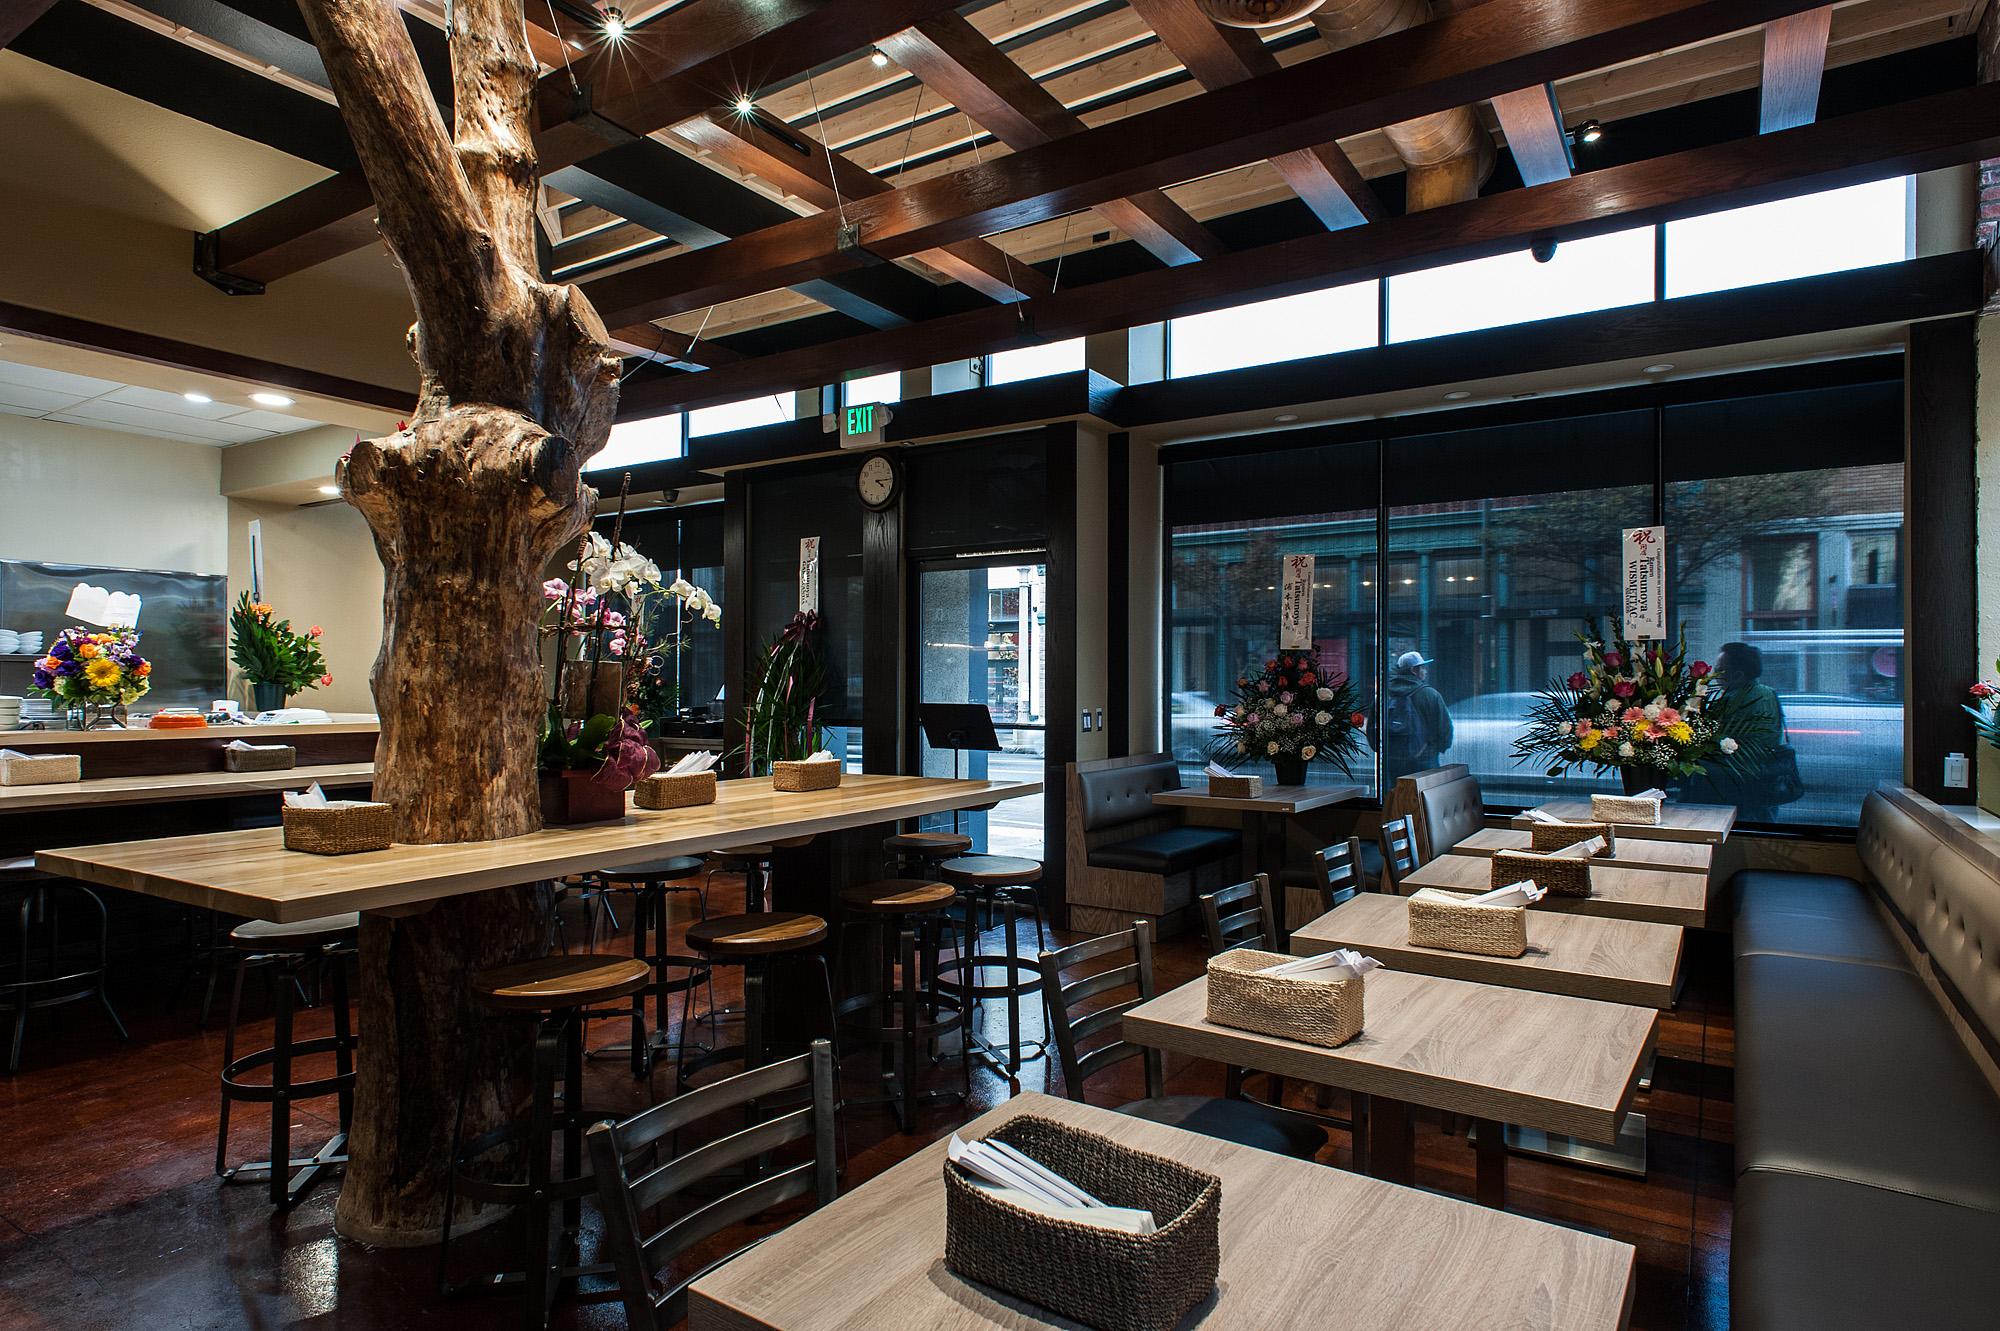 Ramen Tatsunoya Brings Prime Japanese Noodles To Pasadena Eater La